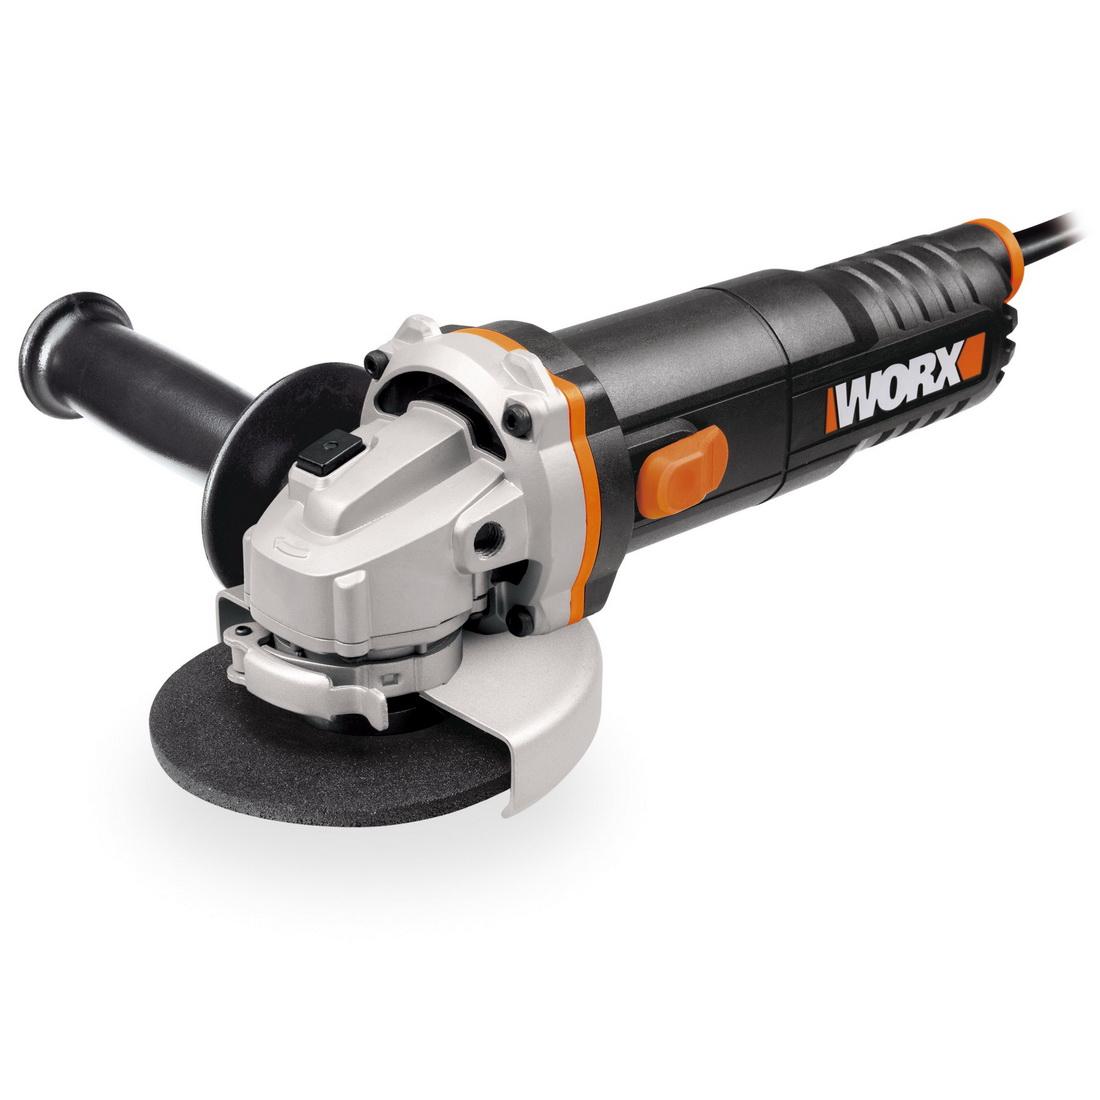 Angle Grinder 750W 115mm 12000/min WX711